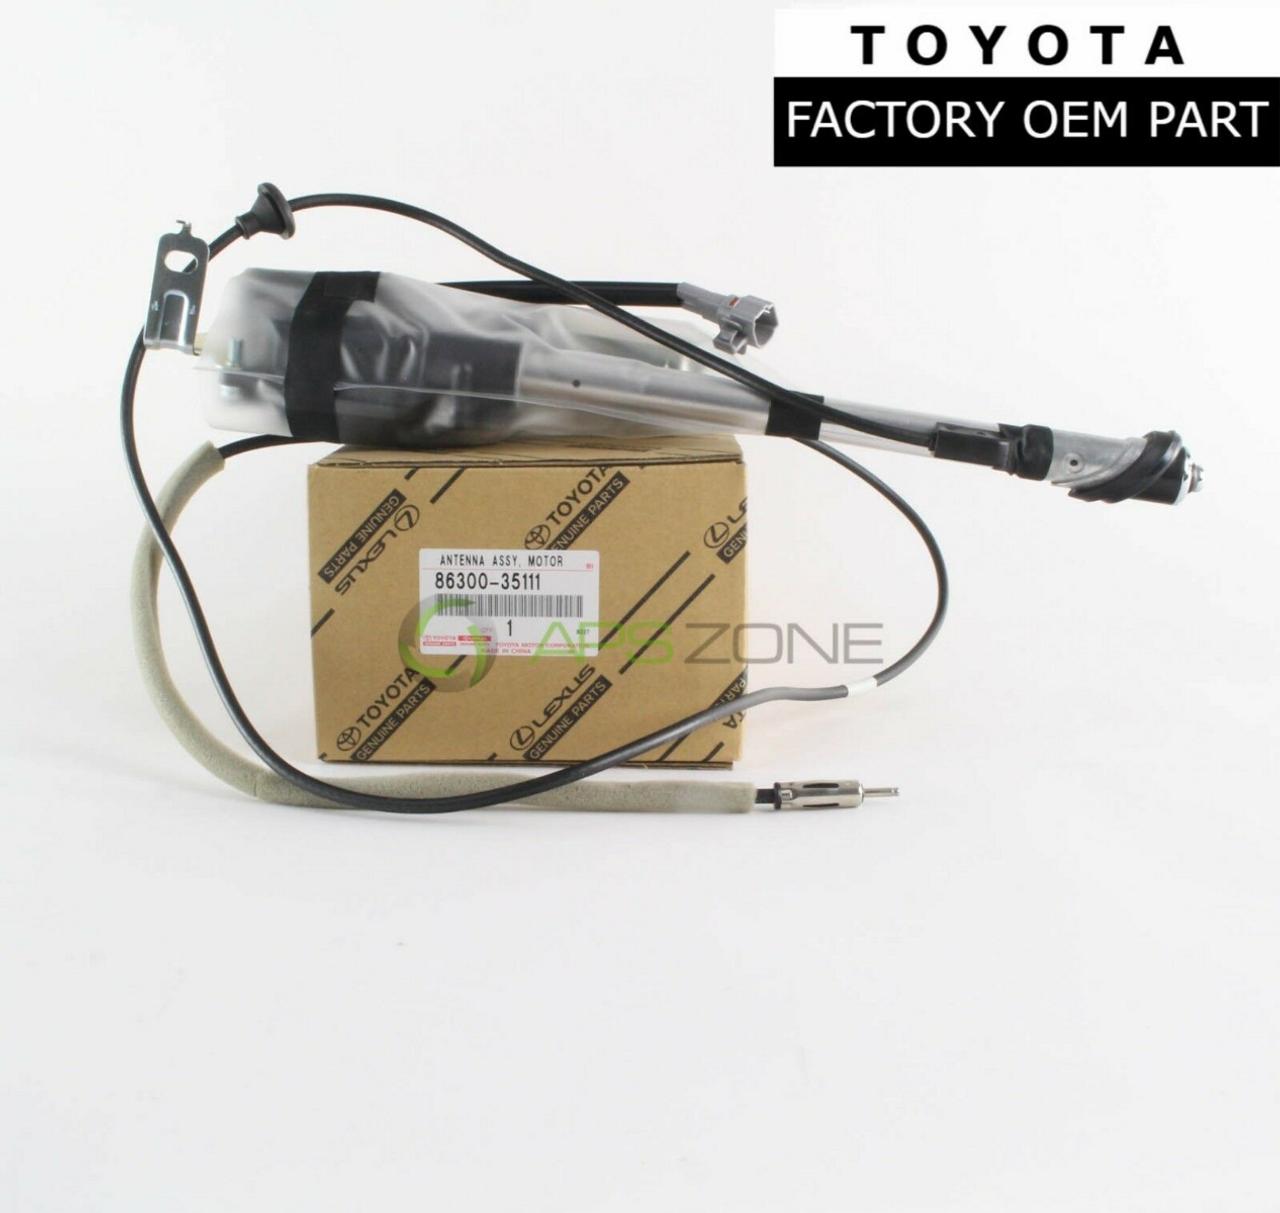 00-05 TOYOTA MR2 SPYDER FACTORY OEM 86392-17110 NEW RADIO ANTENNA ...